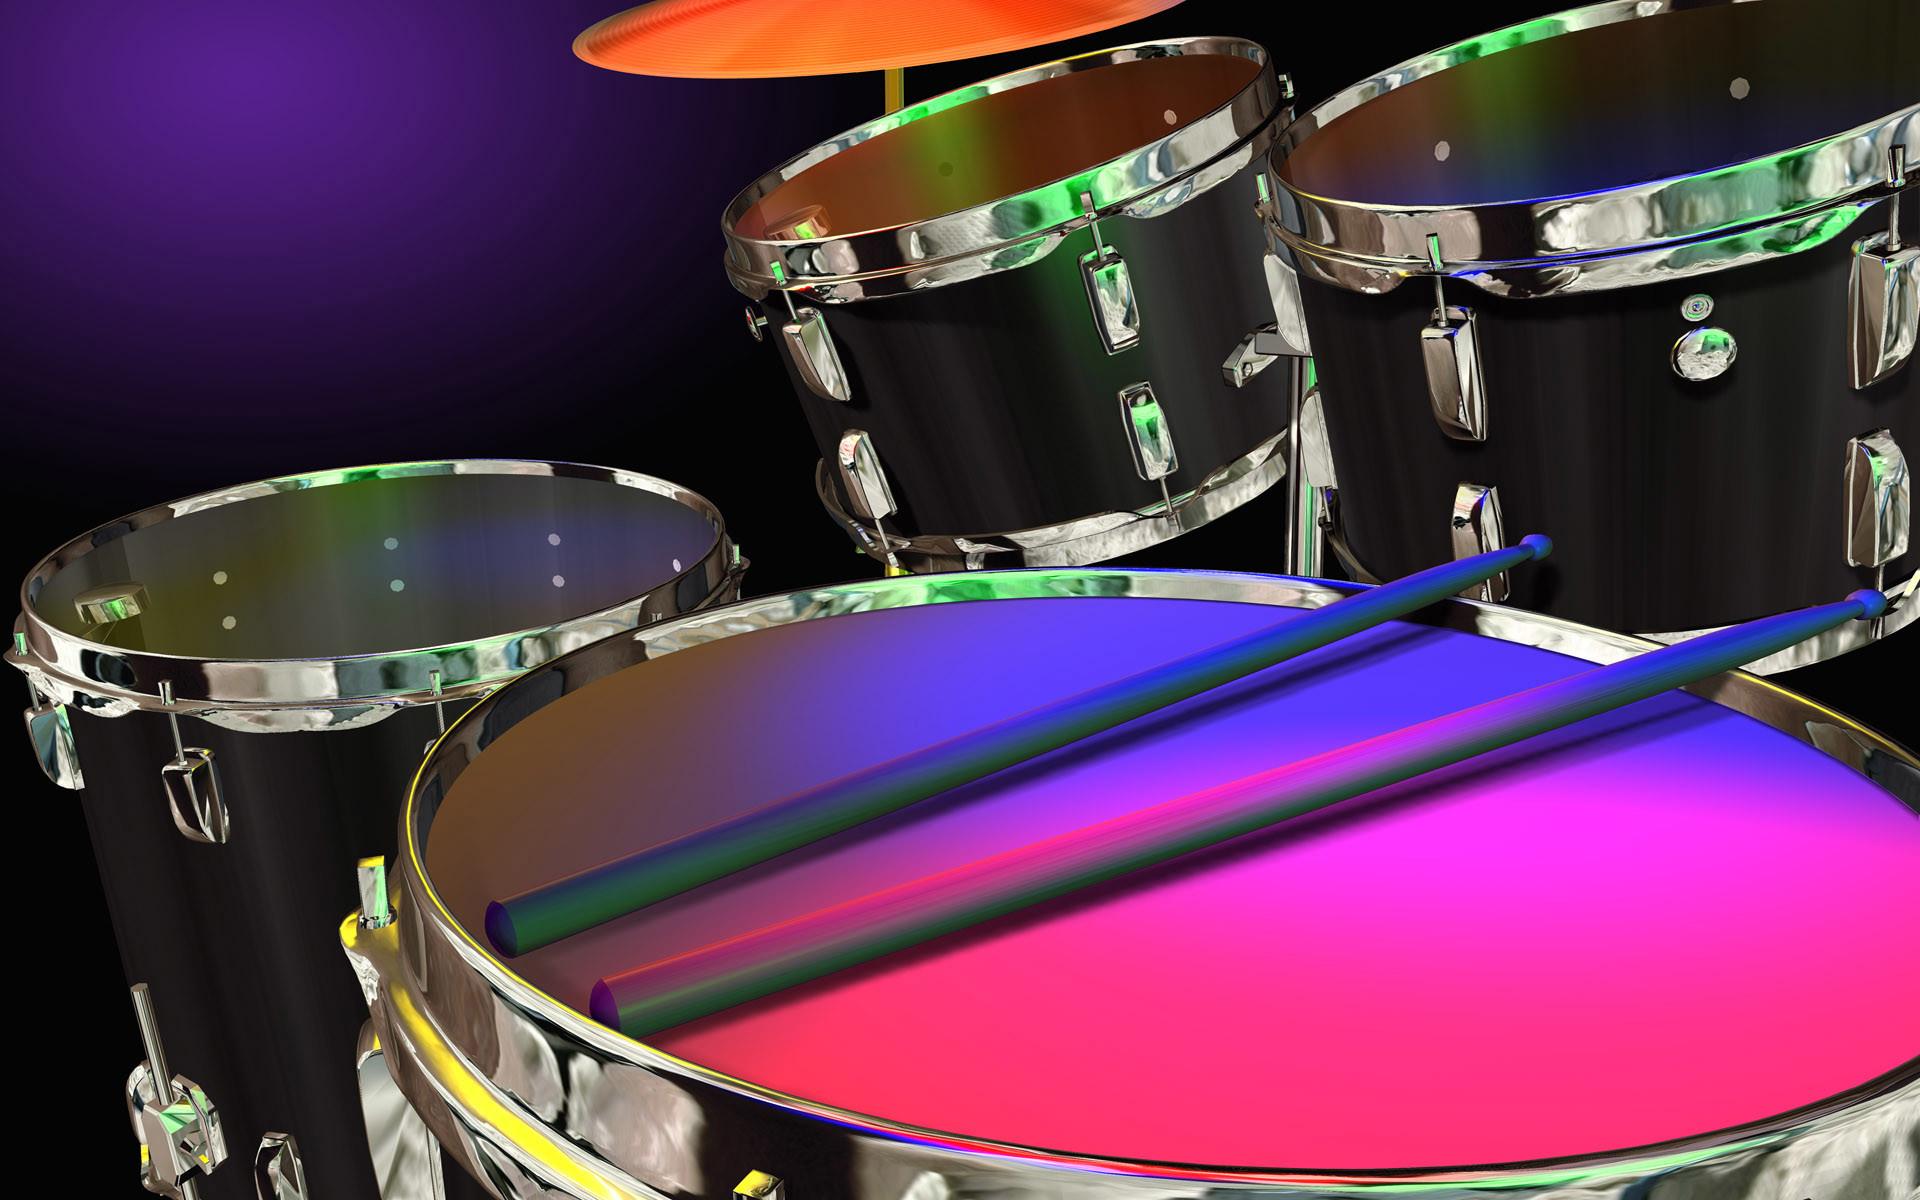 3d drums wallpaper 63226